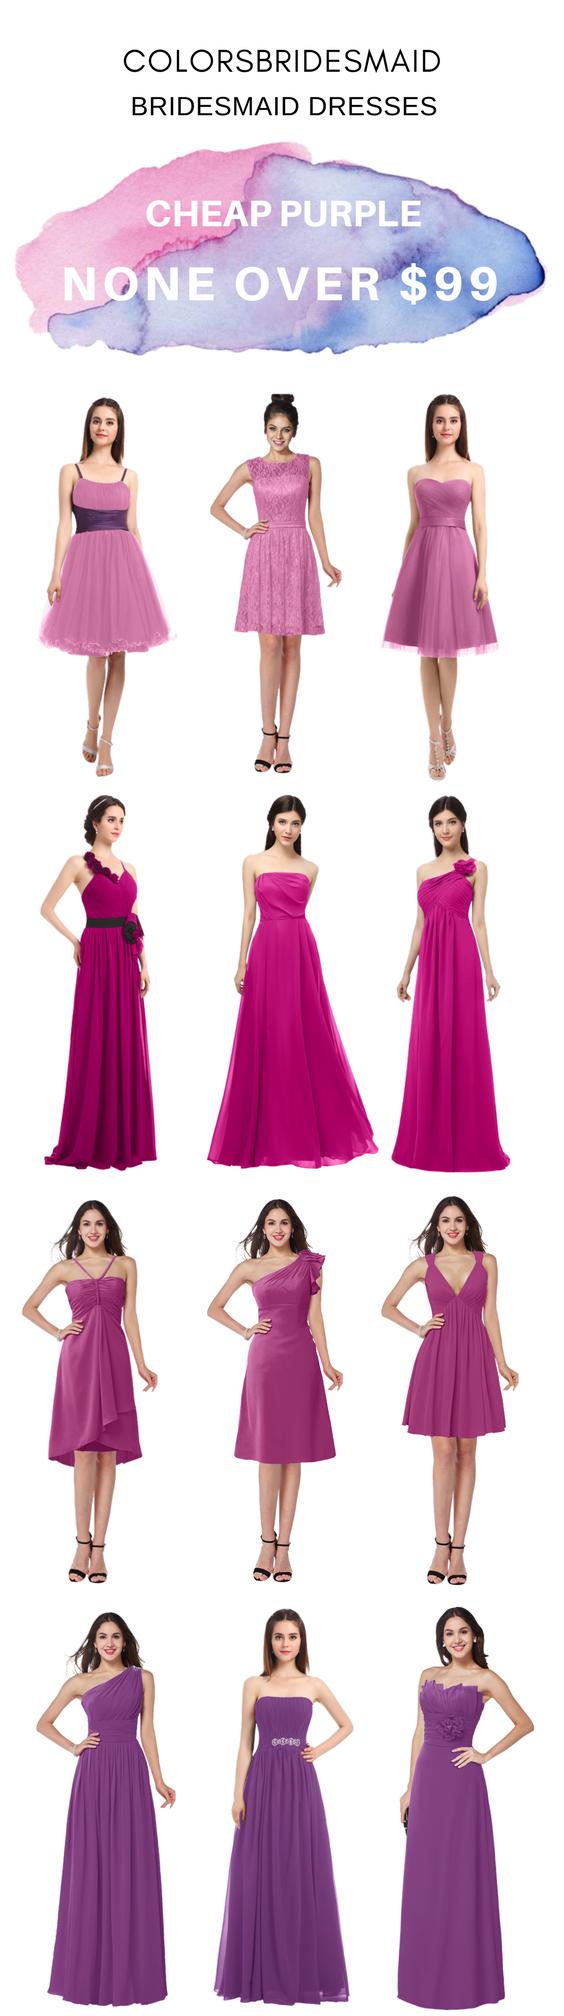 Cheap purple bridesmaid dresses in rosebloom hot pink raspberry